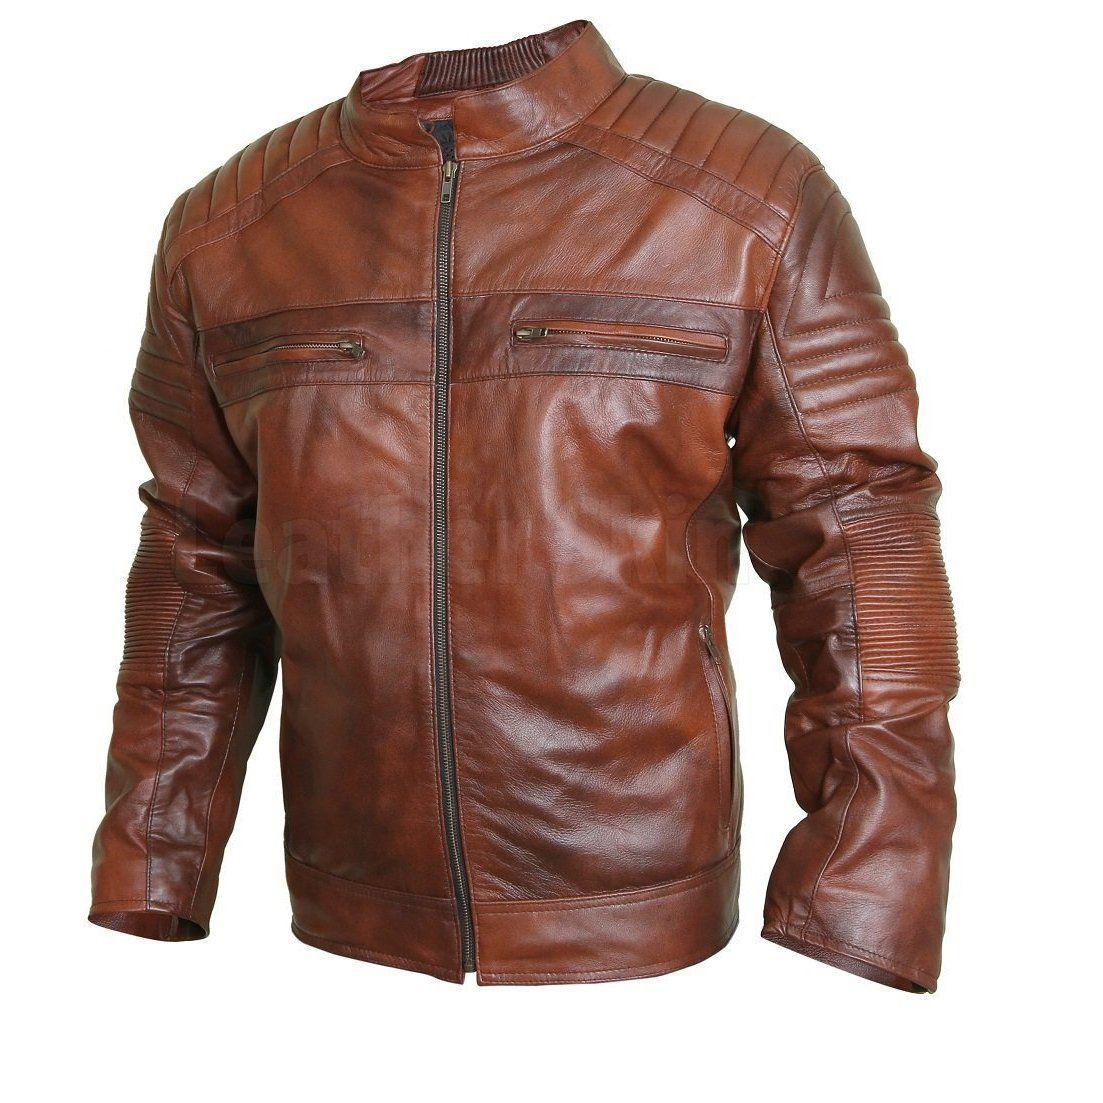 Flamboyant Clay Leather Jacket With Mandarin Collar Leather Jacket Leather Jacket Men Best Leather Motorcycle Jacket [ 1103 x 1103 Pixel ]